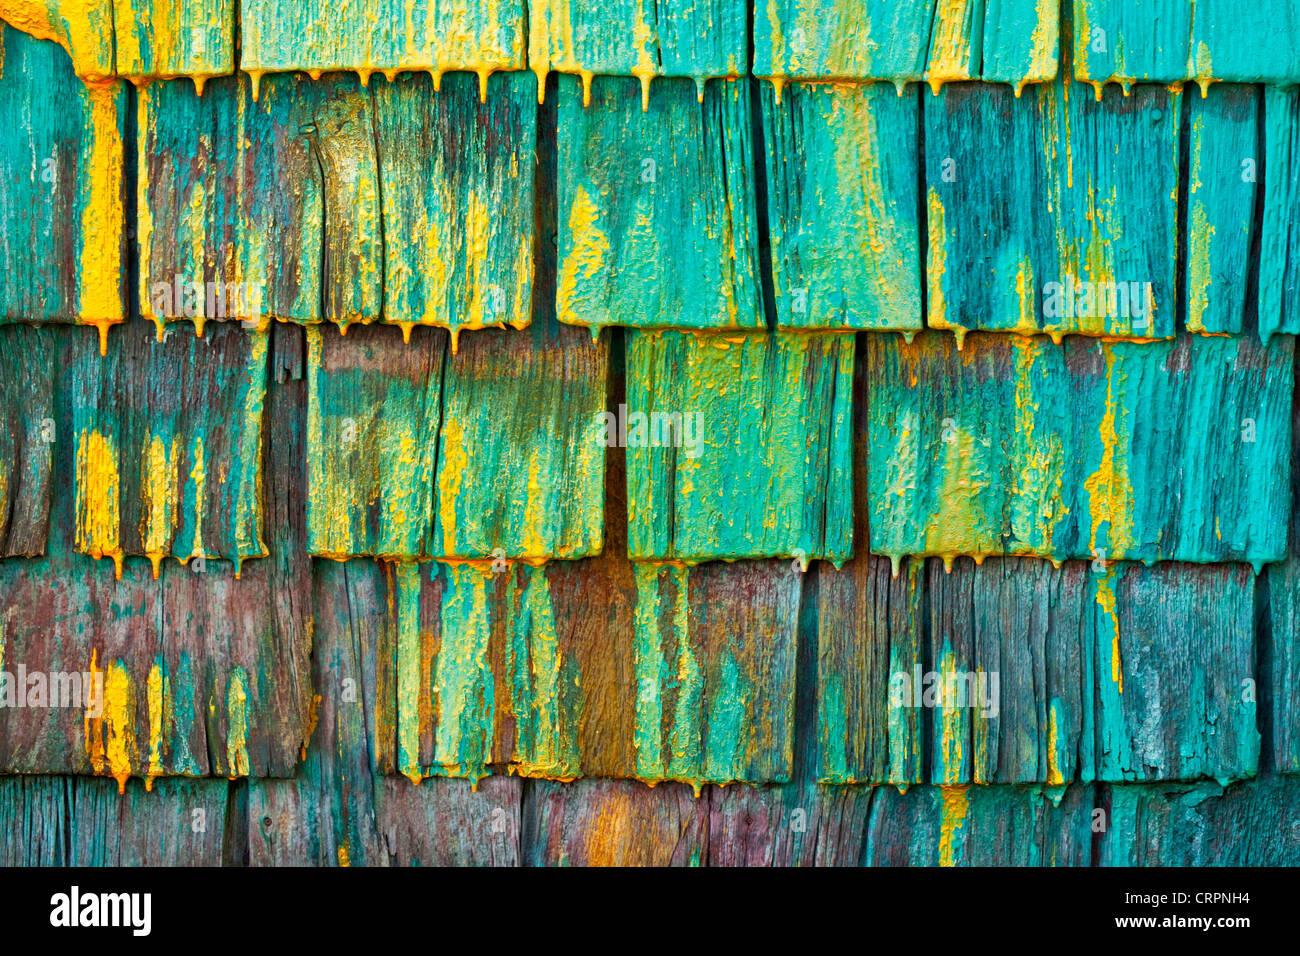 Shingled wall of a fisherman's shed in Nova Scotia, Canada. Stock Photo